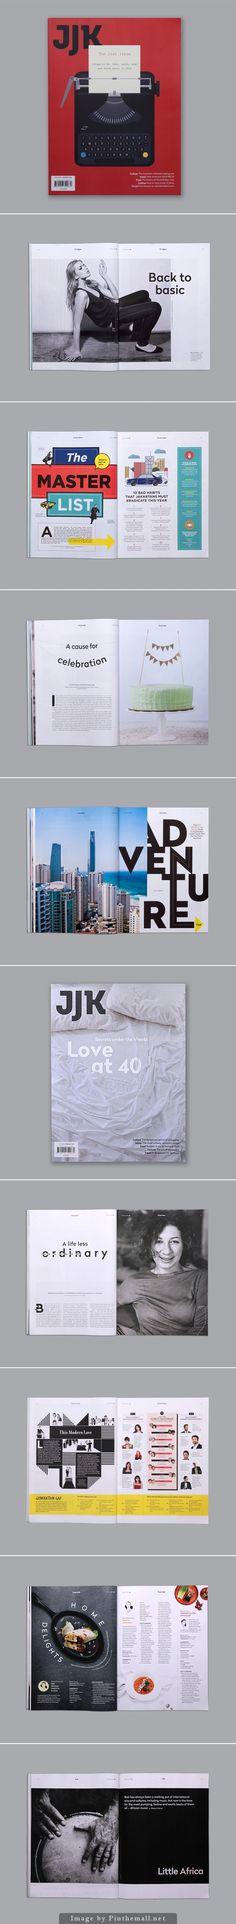 http://www.editorialdesignserved.co/gallery/JJK-Magazine/15259663